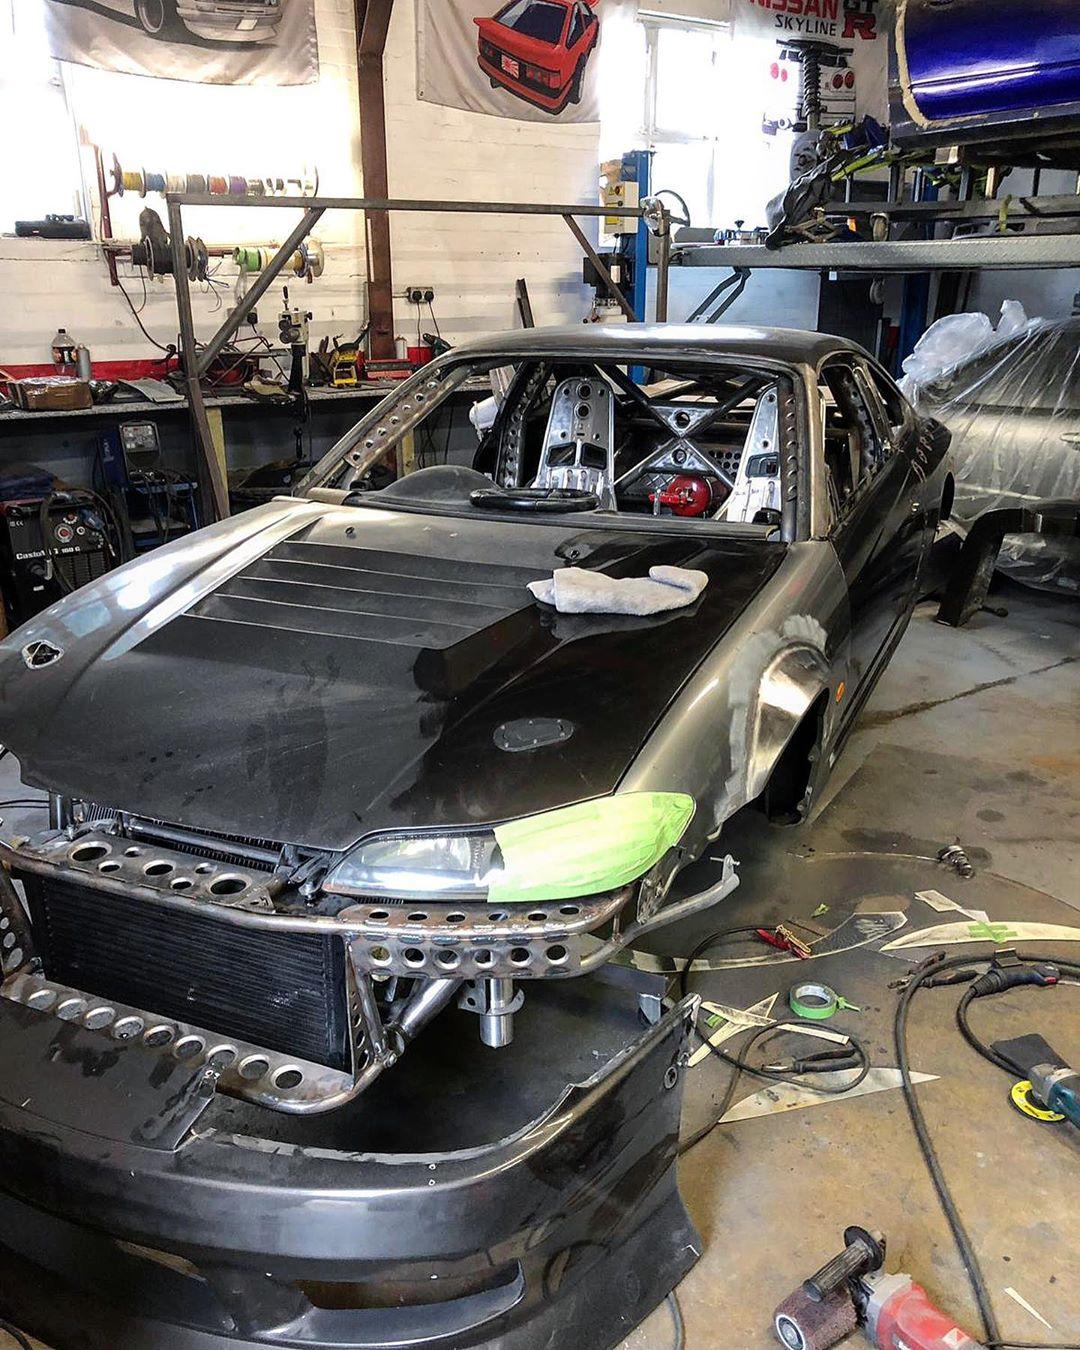 😍 ▪️ ▪️ ▪️ ▪️ ▪️ ▪️ ▪️ ▪️ ▪️ ▪️ sr, Nissan, s15, silvia, silvias15, s15silvia, sr20det, welding, 240sx, speedhunters, sbody, schassis, stance, stancenation, fitteduk, fabrication, slammed, fabwork, 200sx, s13, s14, s14a, SR20, silvianation, sxoc, paintwork, drift, drifting, driftcar, showcar